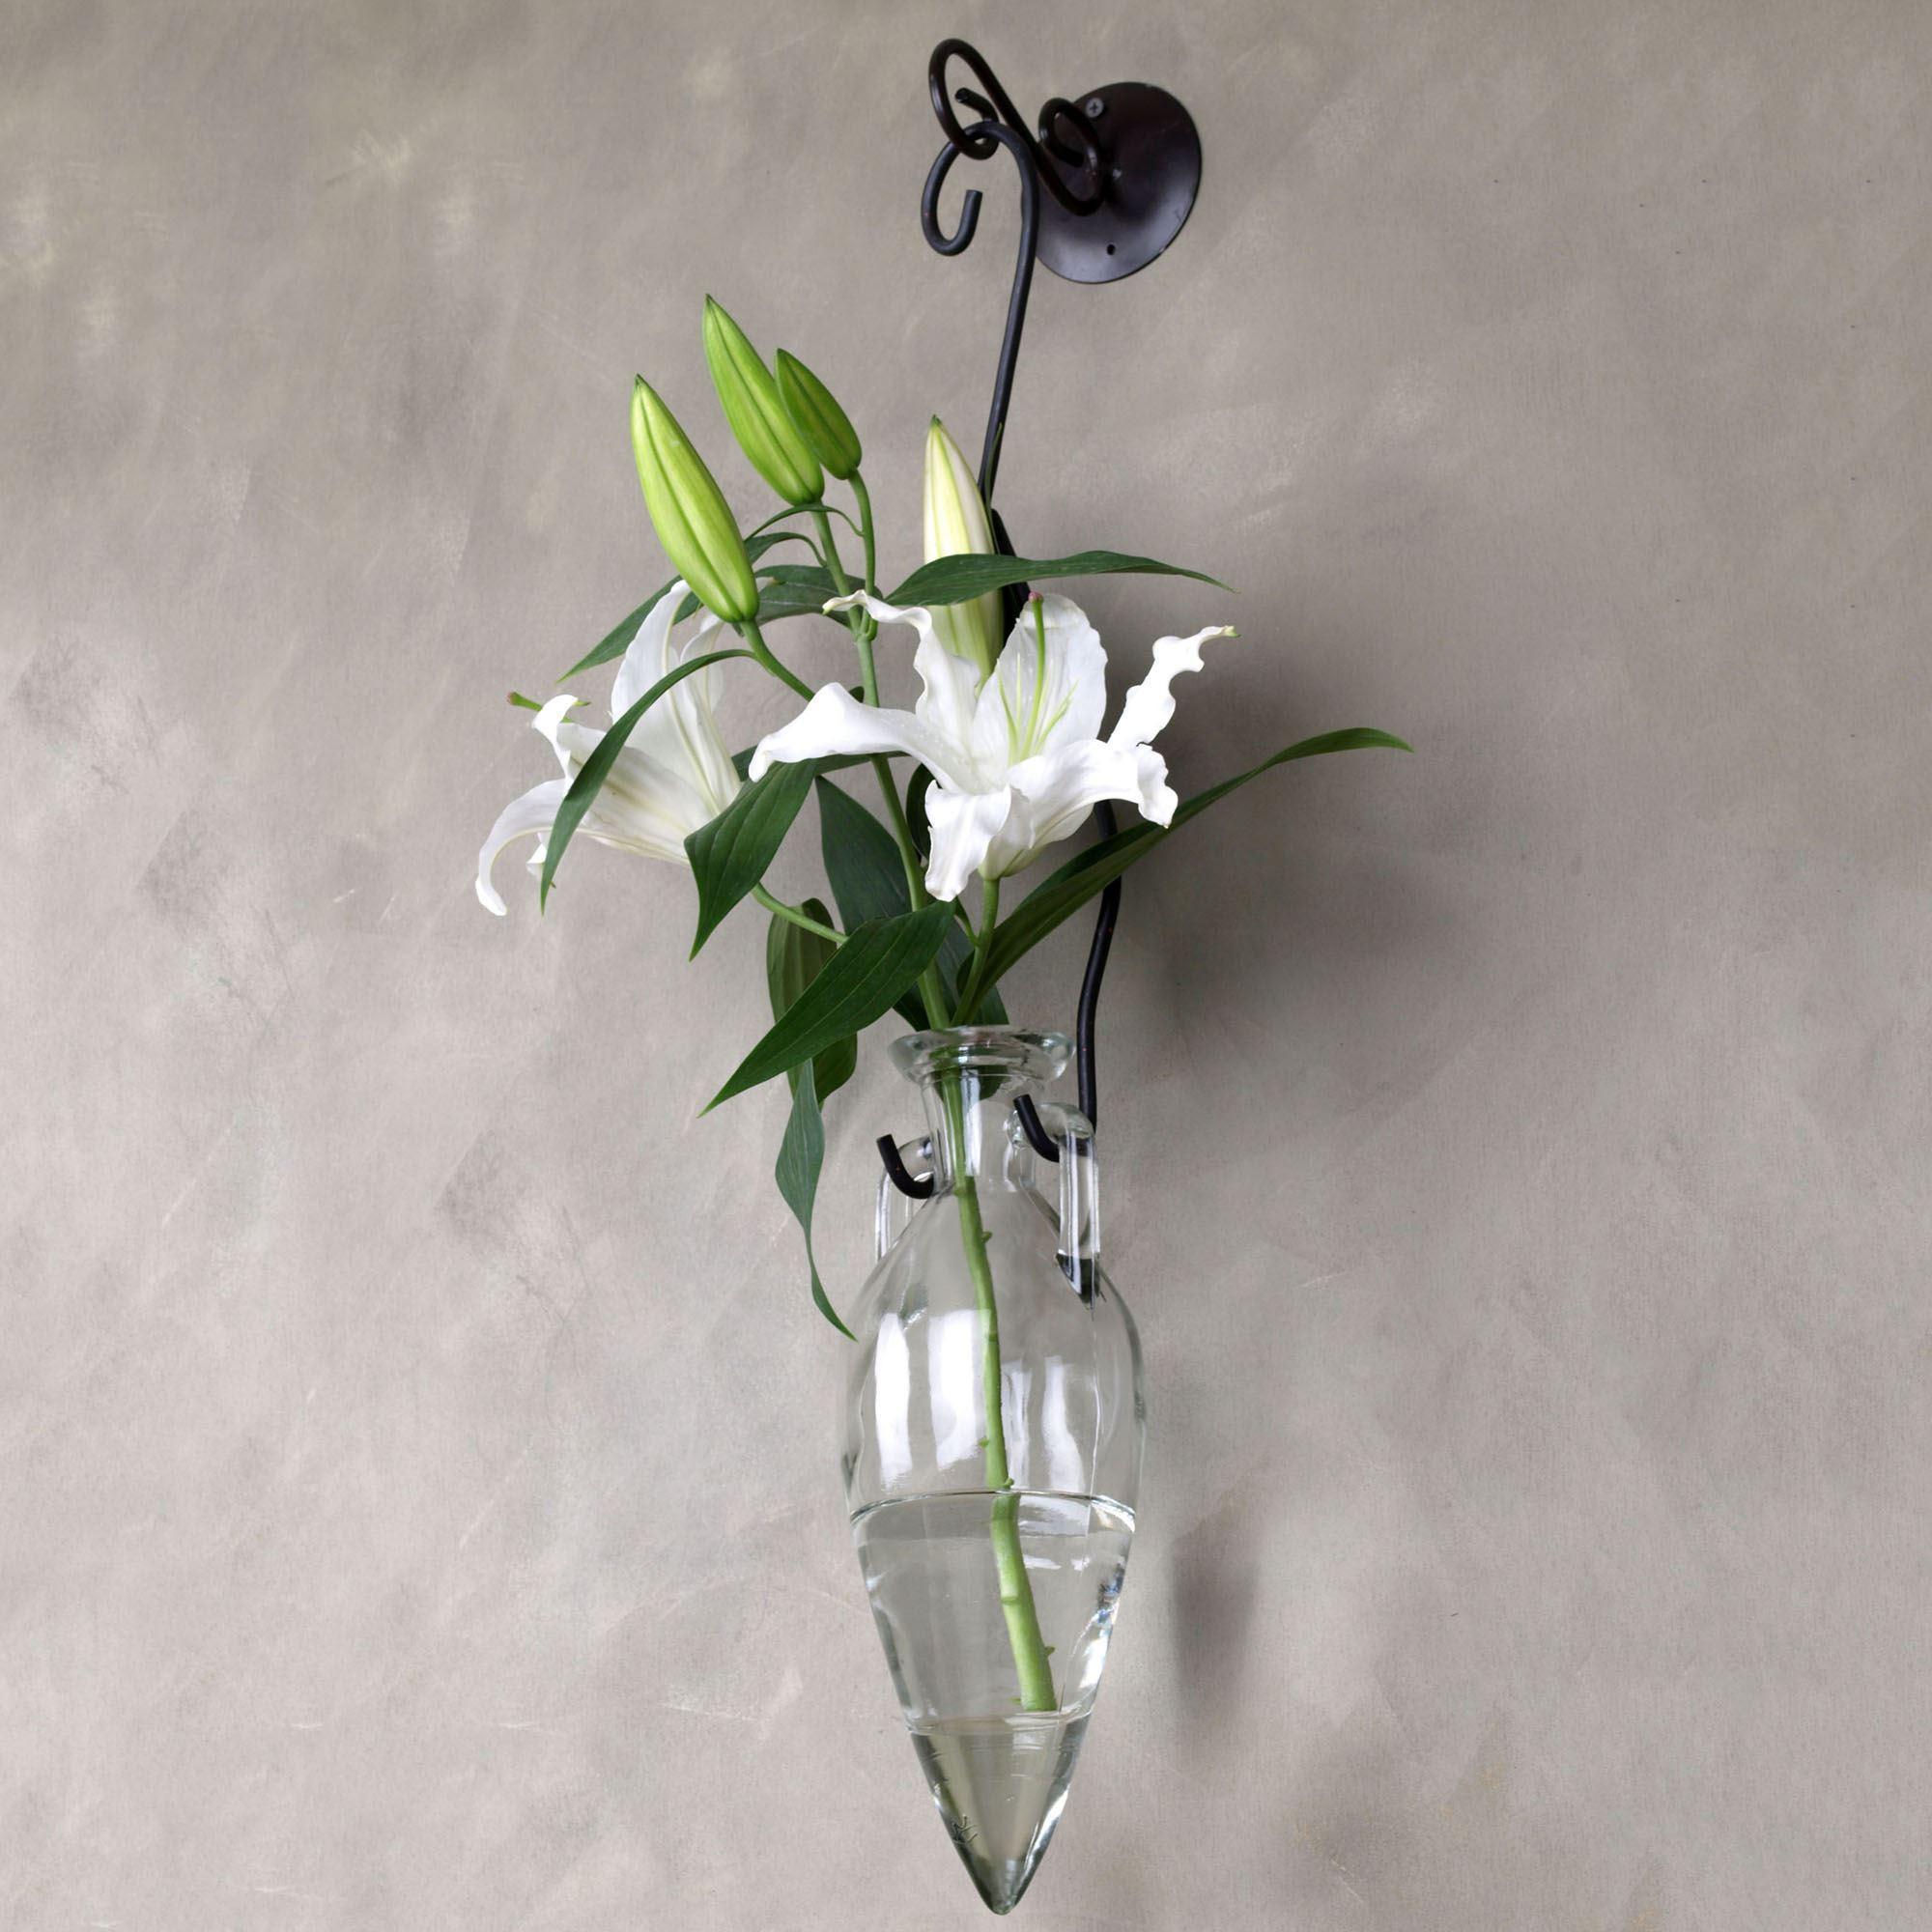 mccoy white vase of cheap metal vases photograph h vases wall hanging flower vase inside cheap metal vases photograph h vases wall hanging flower vase newspaper i 0d scheme wall scheme